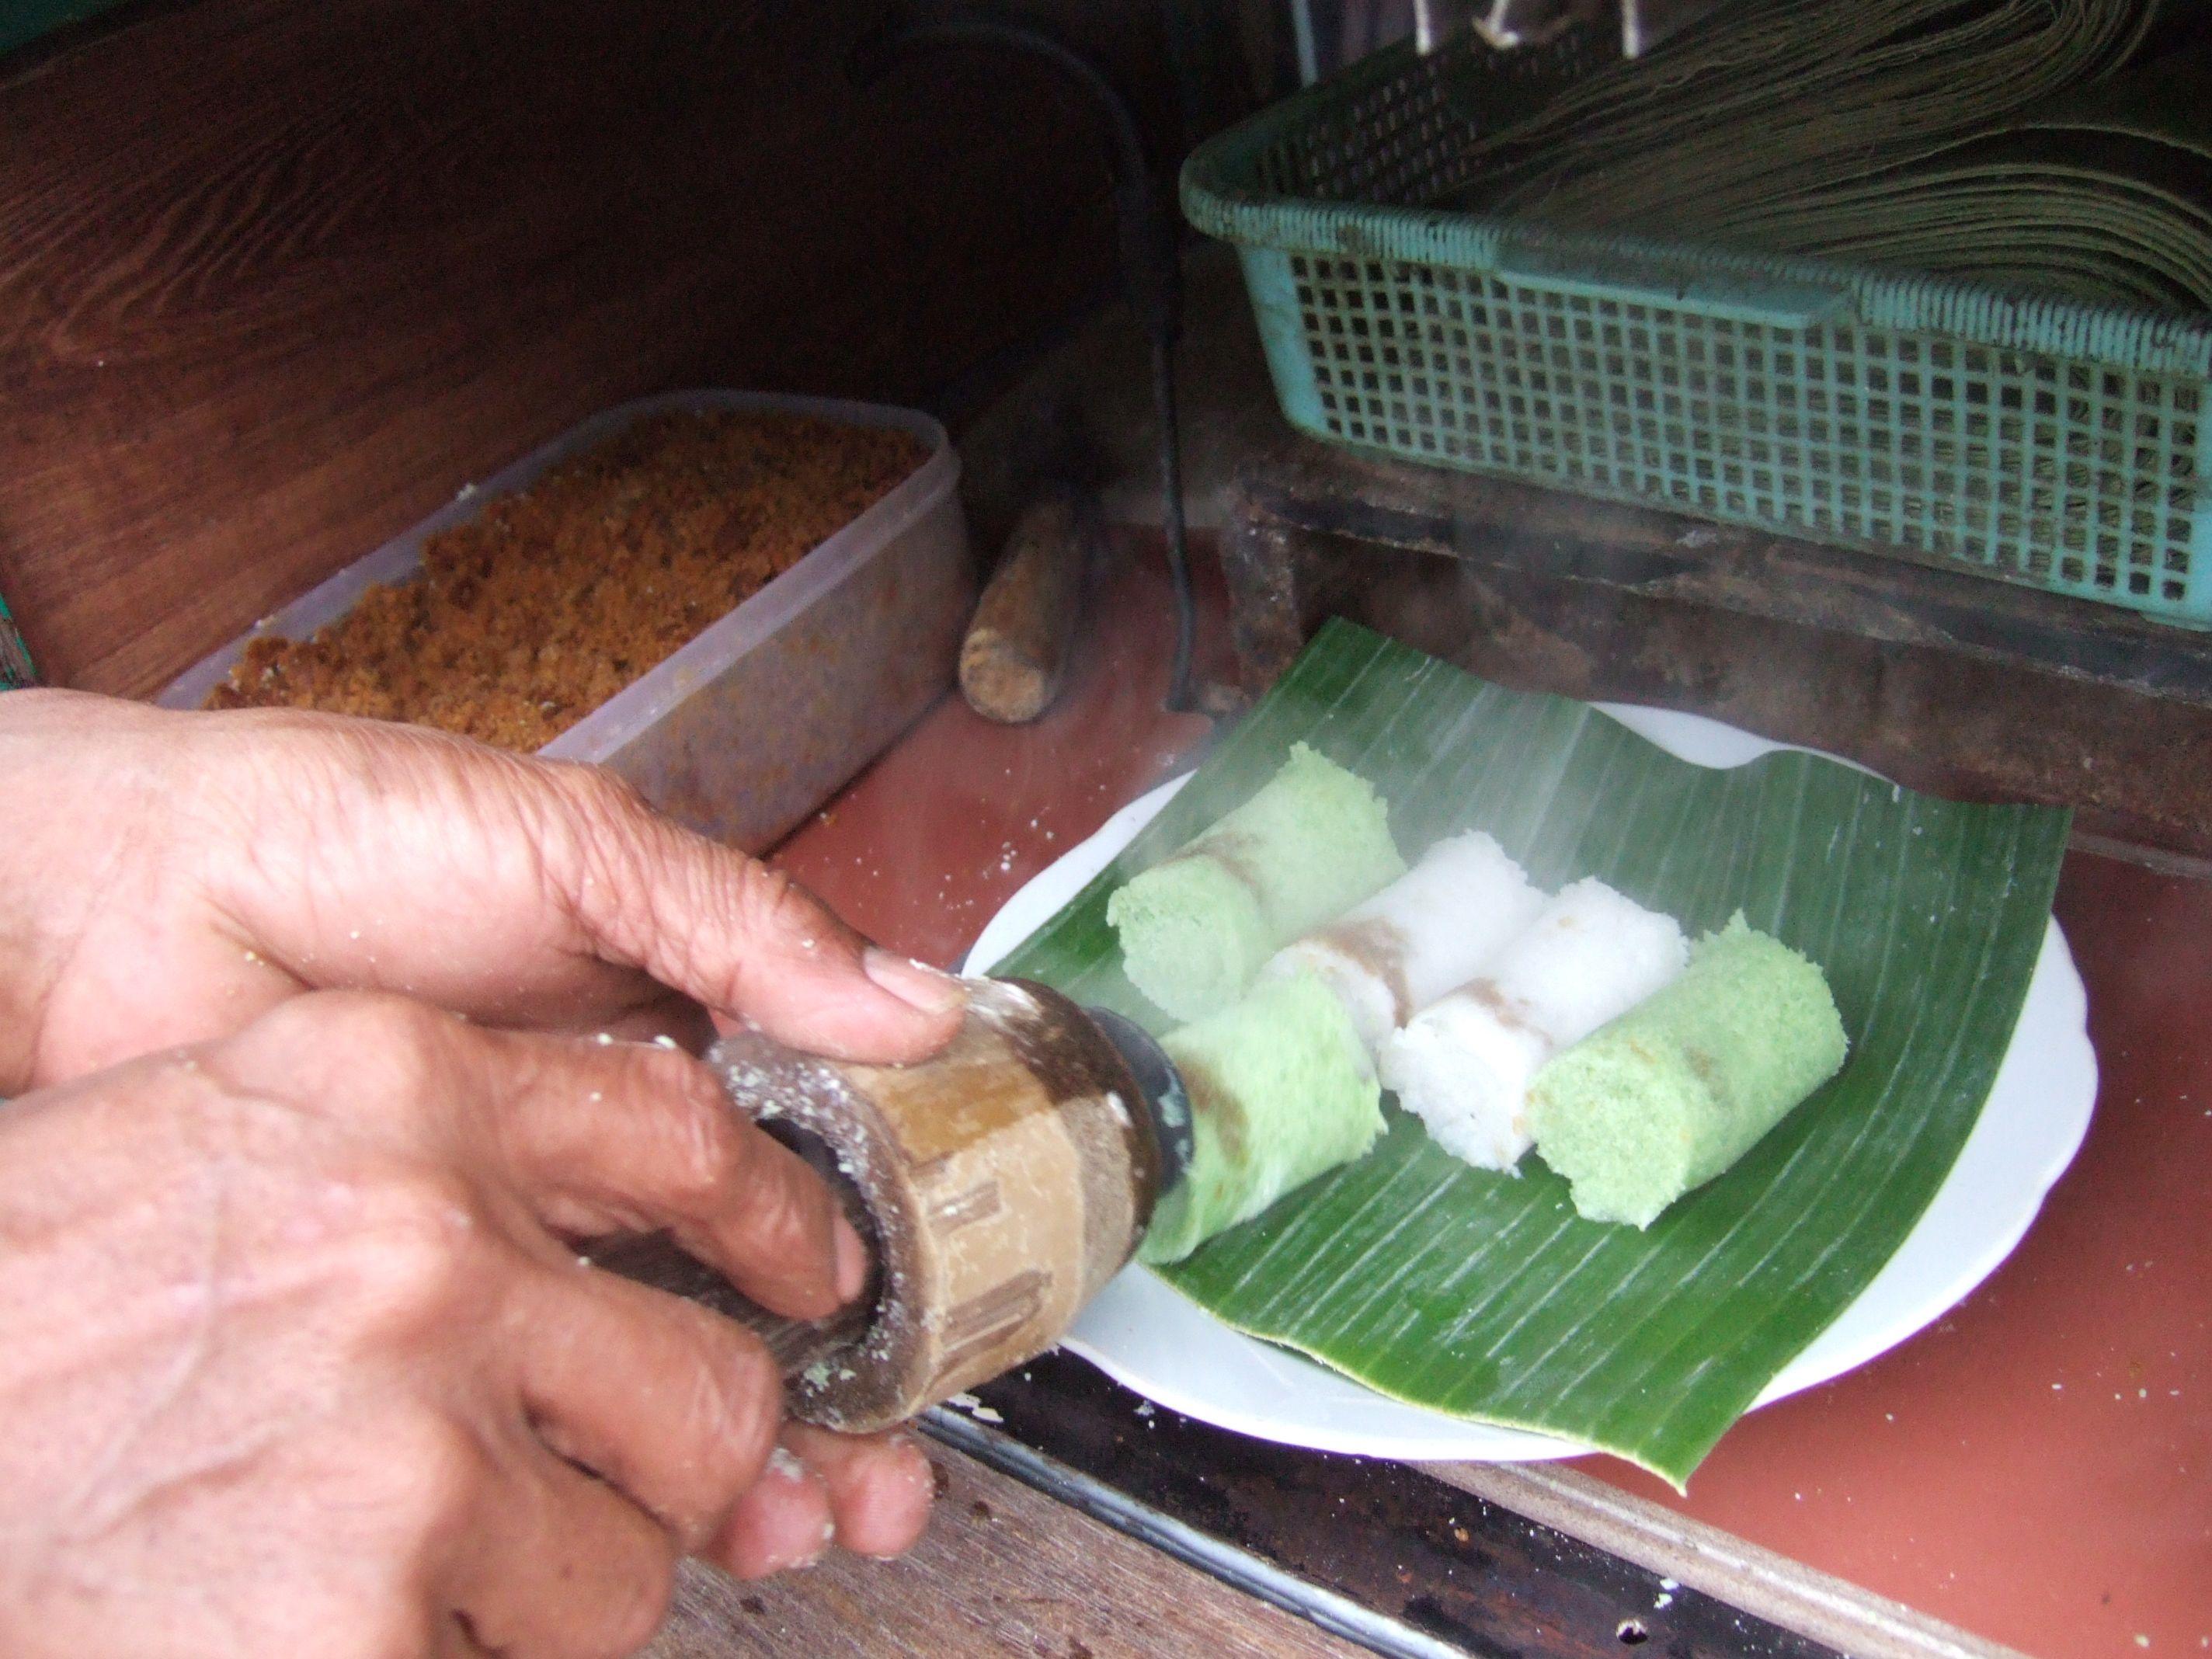 Kue Putu Putu Bambu Kue Jadul Makanan Tradisional Cemilan Indonesia Putu Kelapa Makanan Indonesia Makanan Te Makanan Indonesia Cemilan Masakan Indonesia